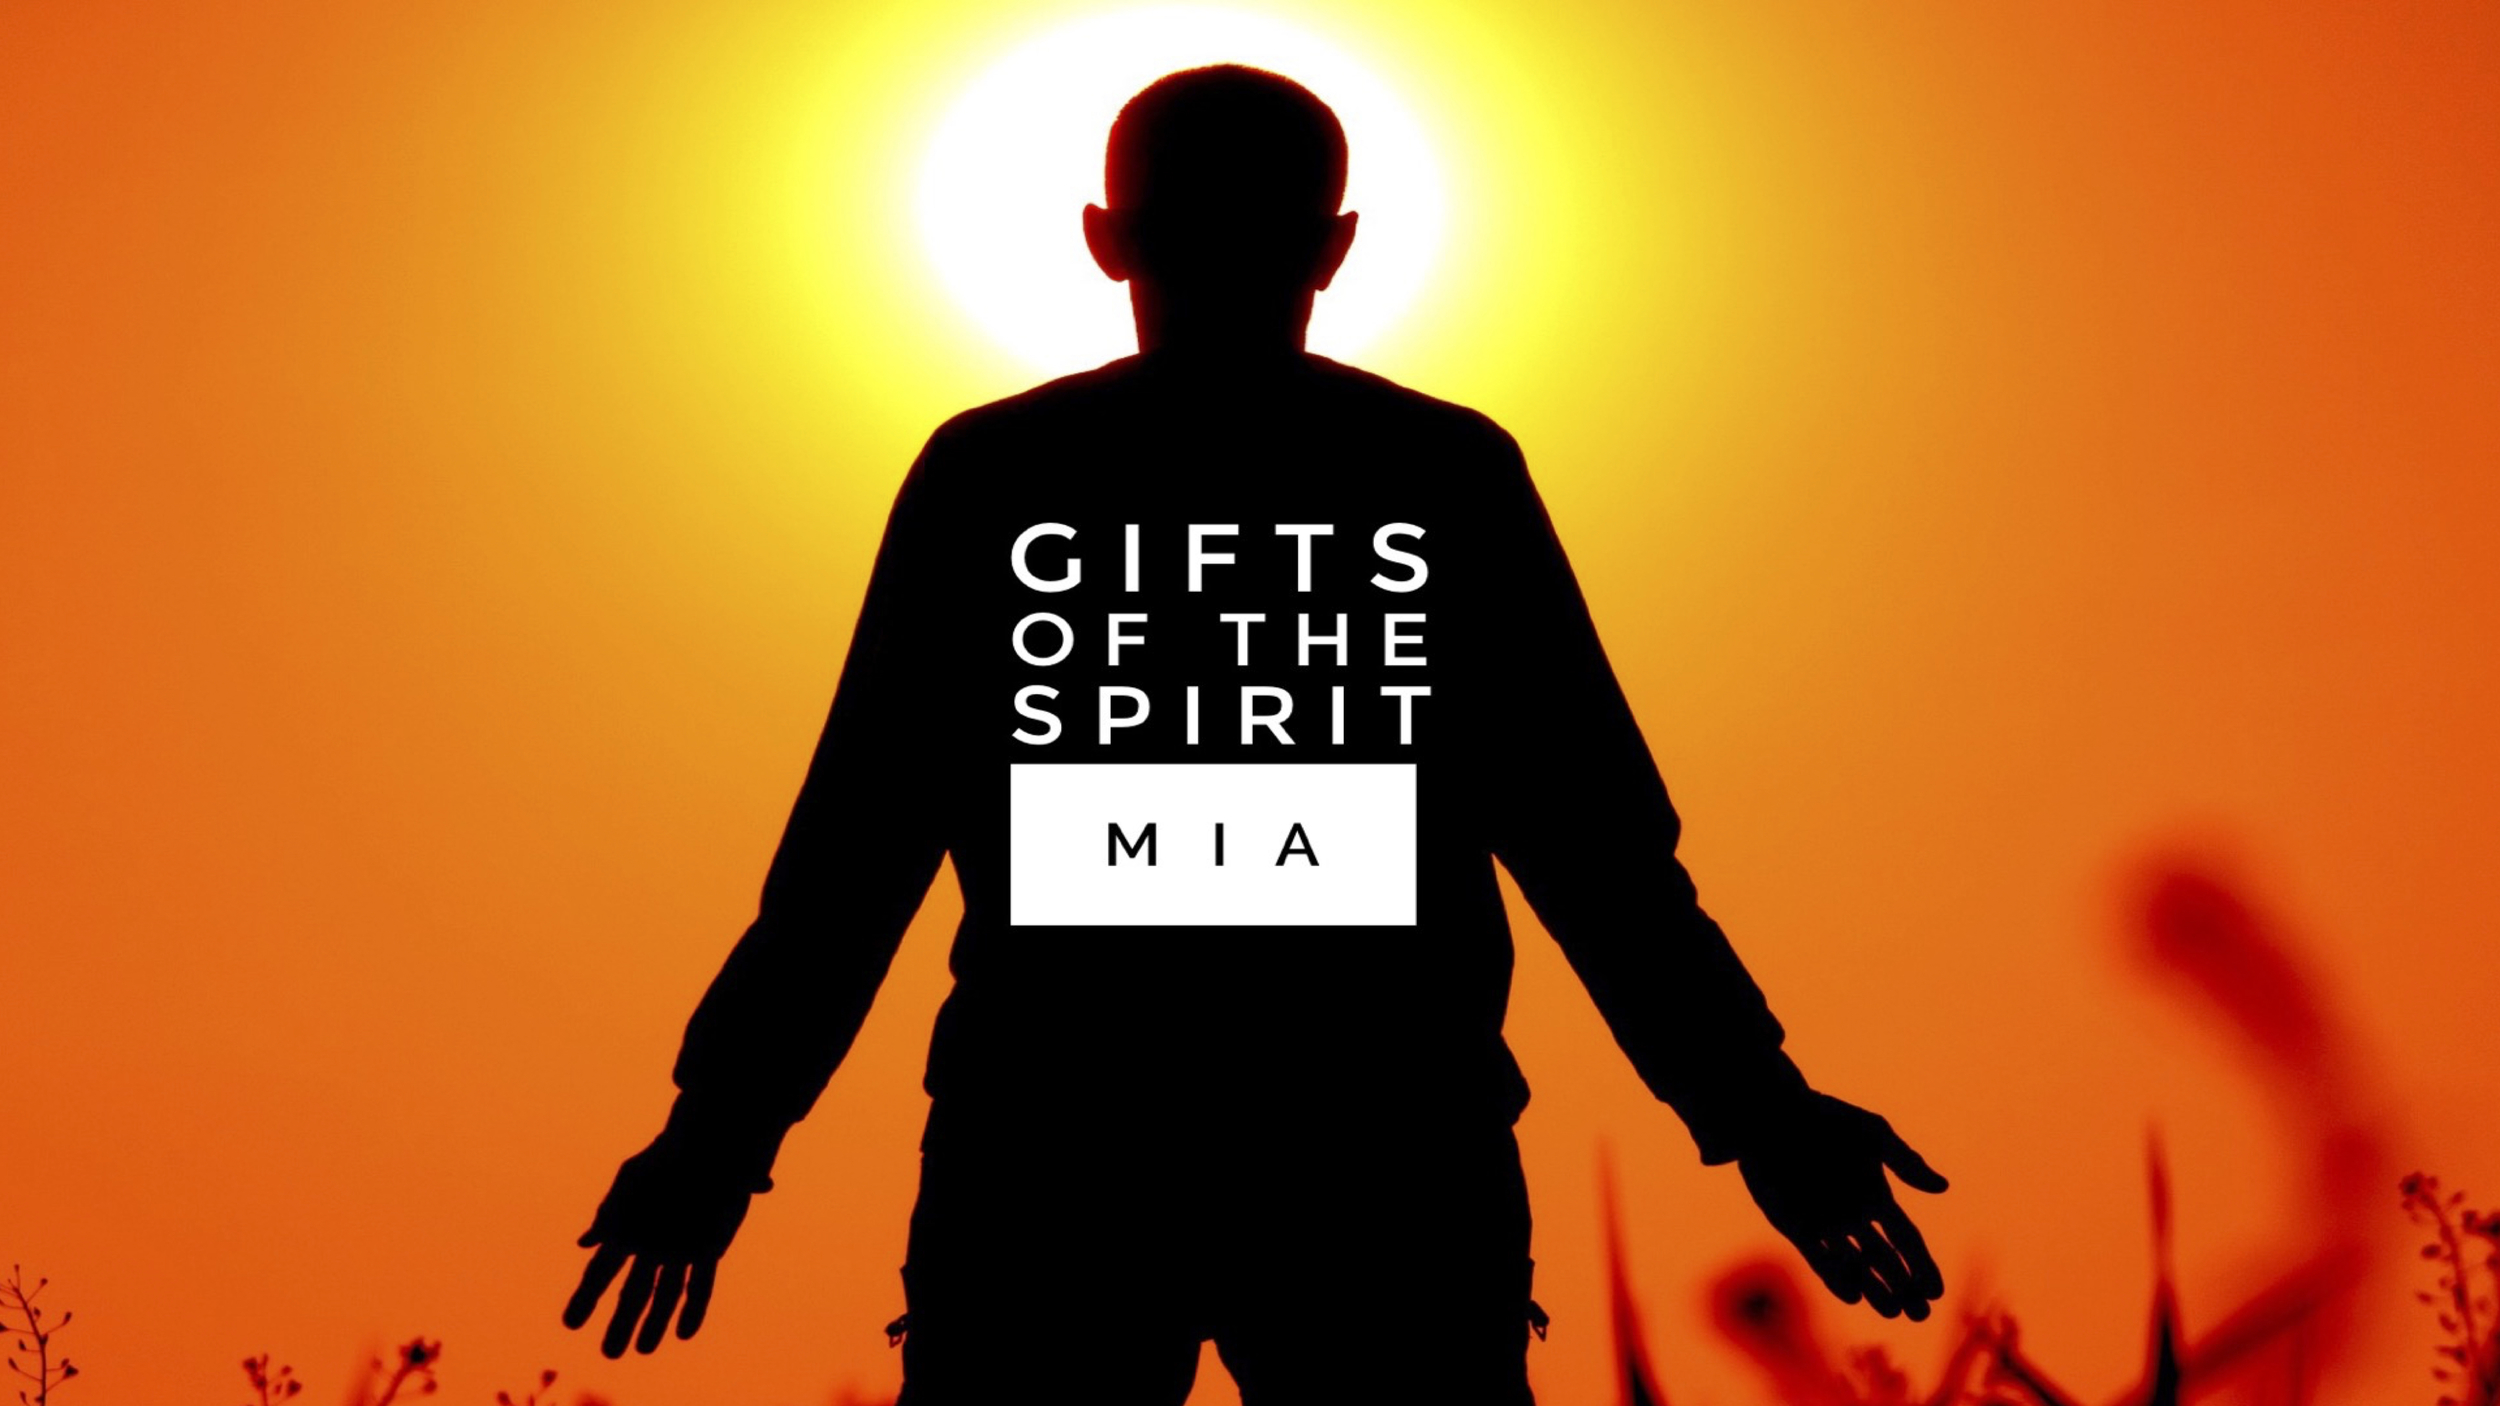 gifts of the Spirit MIA slide.jpg